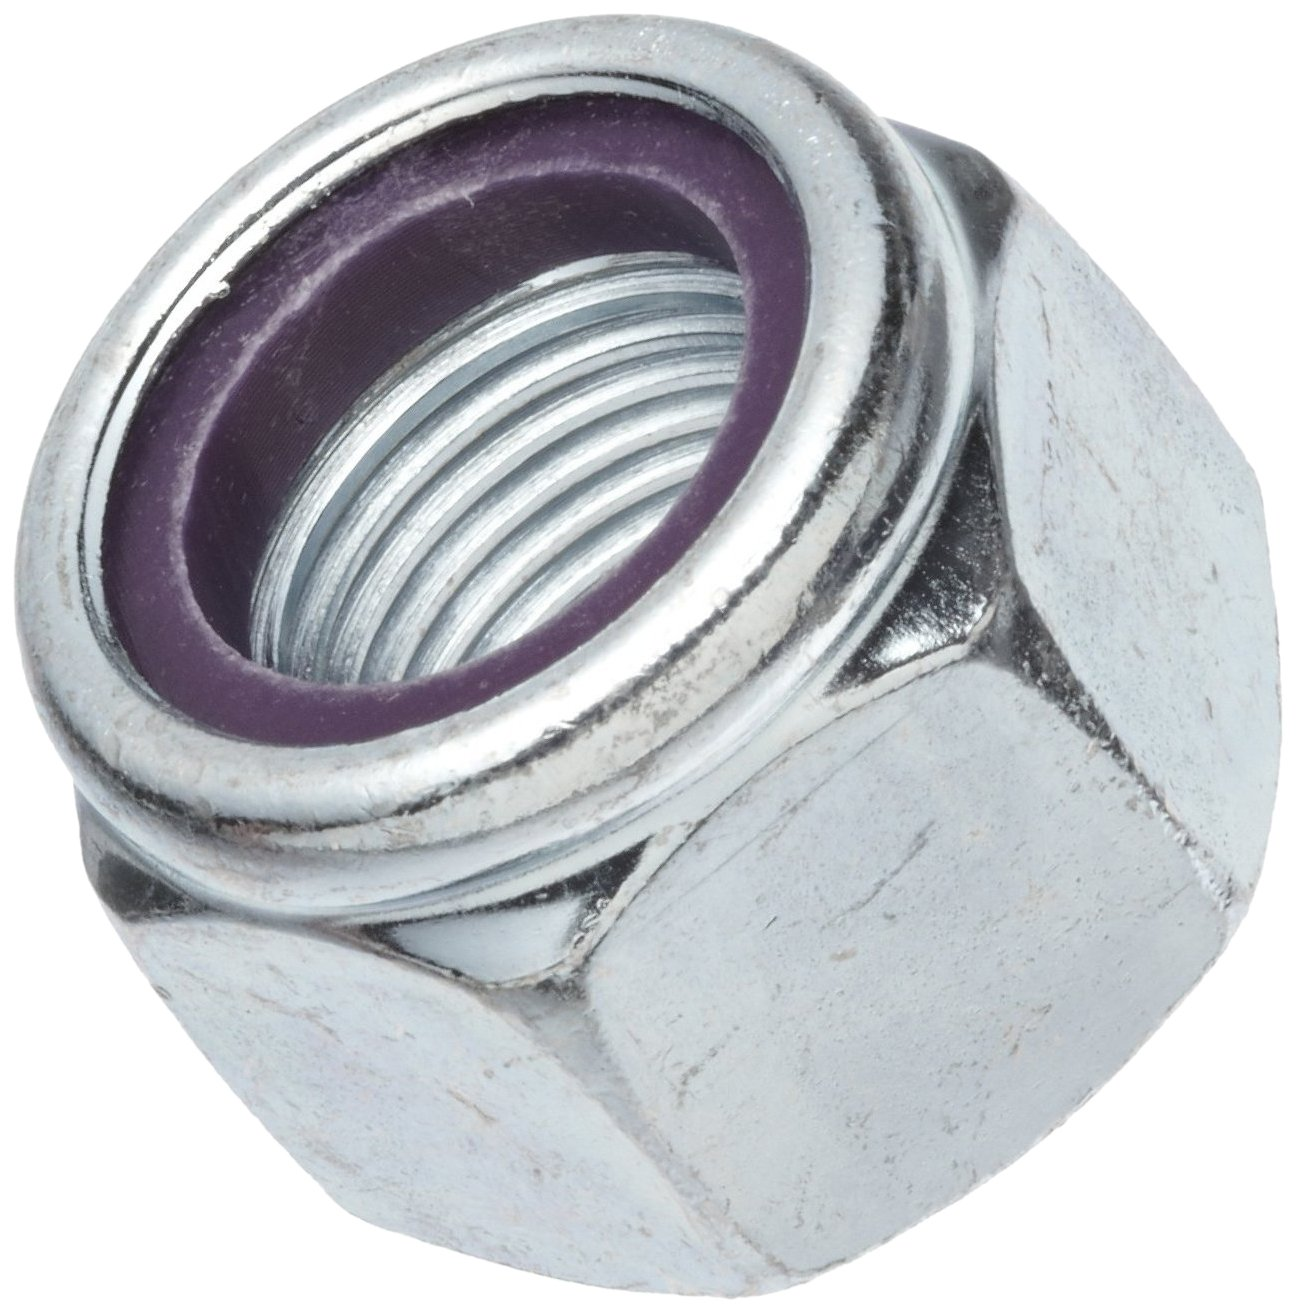 Self-Locking Nylon Insert Pack of 100 #4-40 Threads Zinc Plated Finish Right Hand Threads 0.268 Width Across Flats Grade 2 Steel Machine Screw Hex Nut